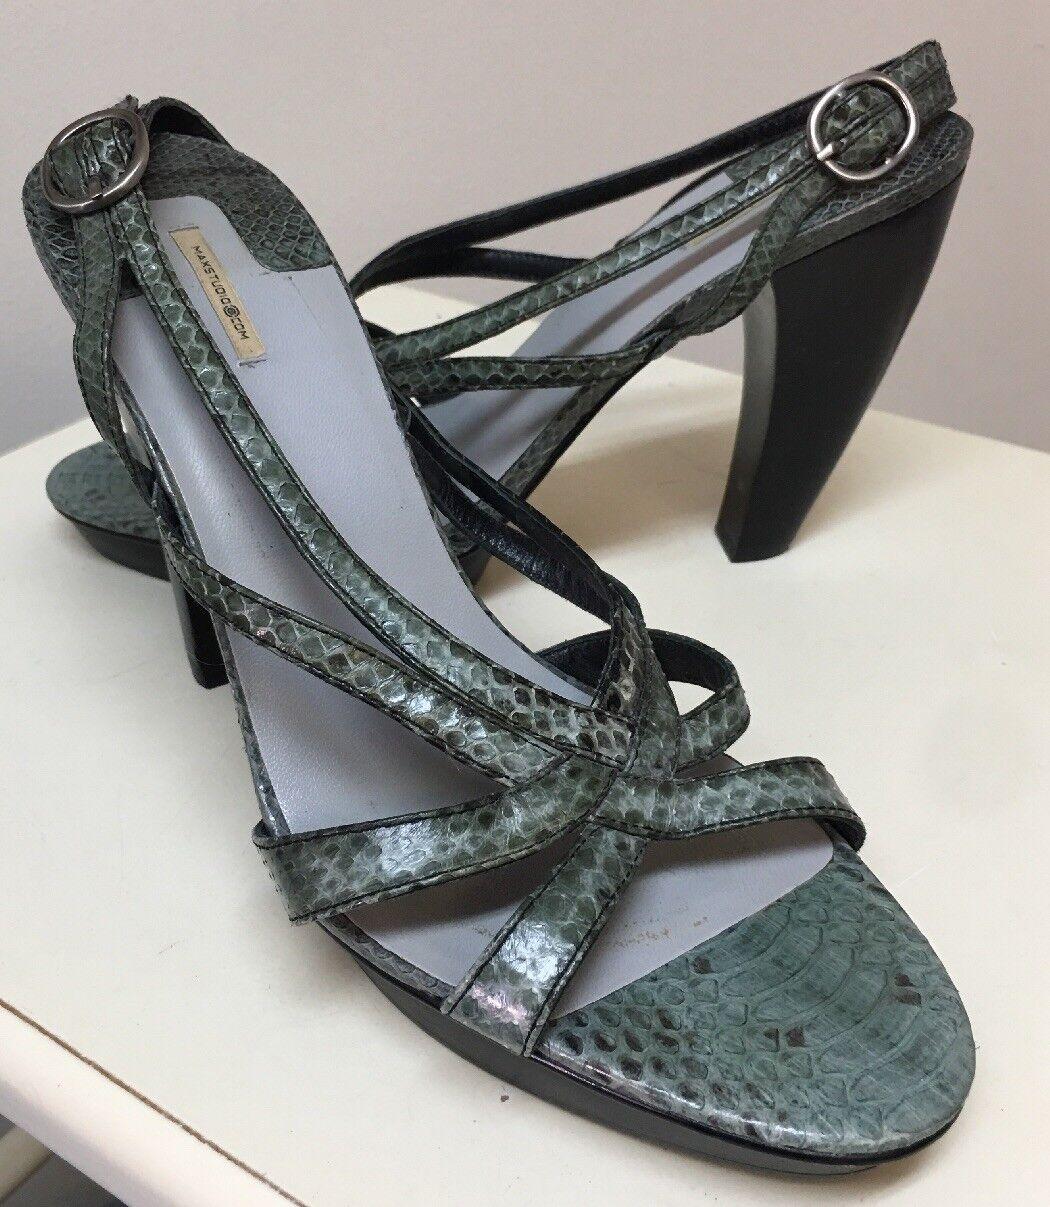 Max Studio Sandal Size 9 Snakeskin Open Toe Pump Heel Platform Curved Beautiful